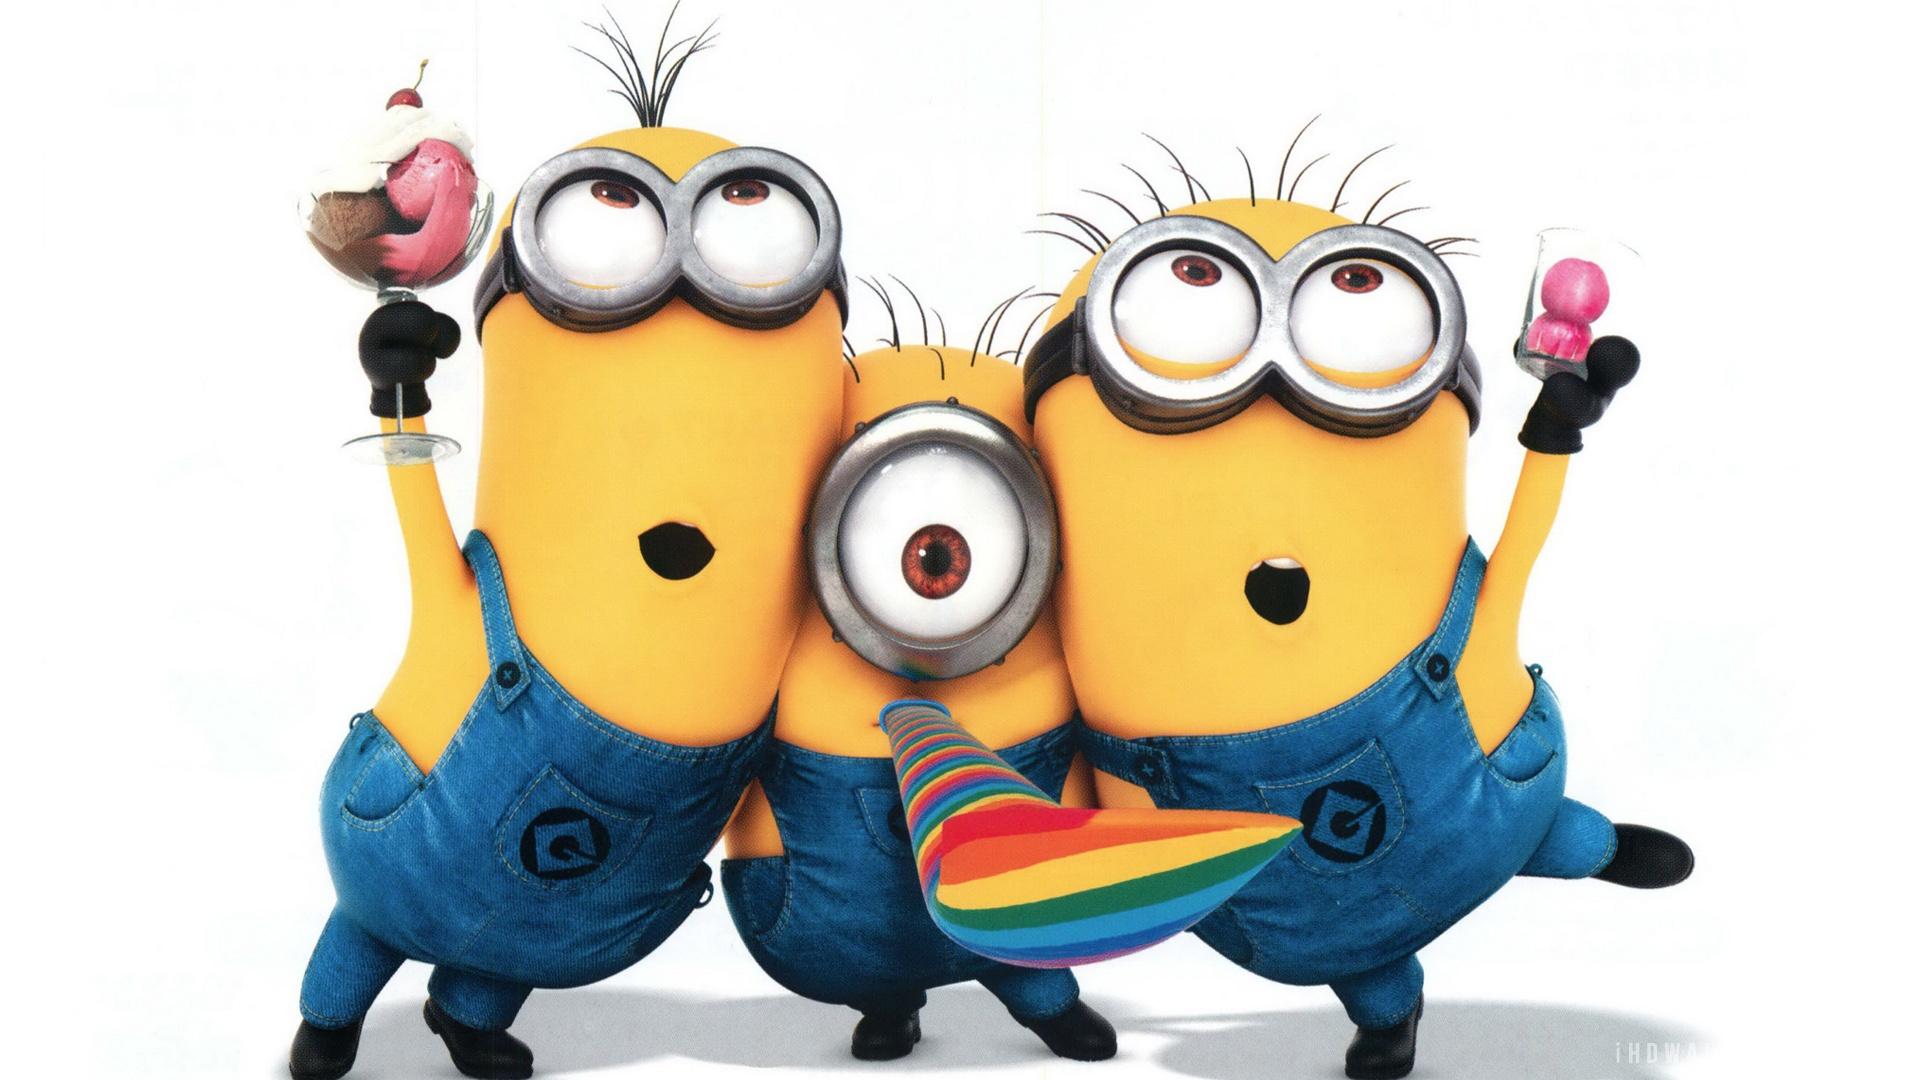 Minion Funny Minions Anime Movies Hd Wallpaper with 1920x1080 Cartoon 1920x1080